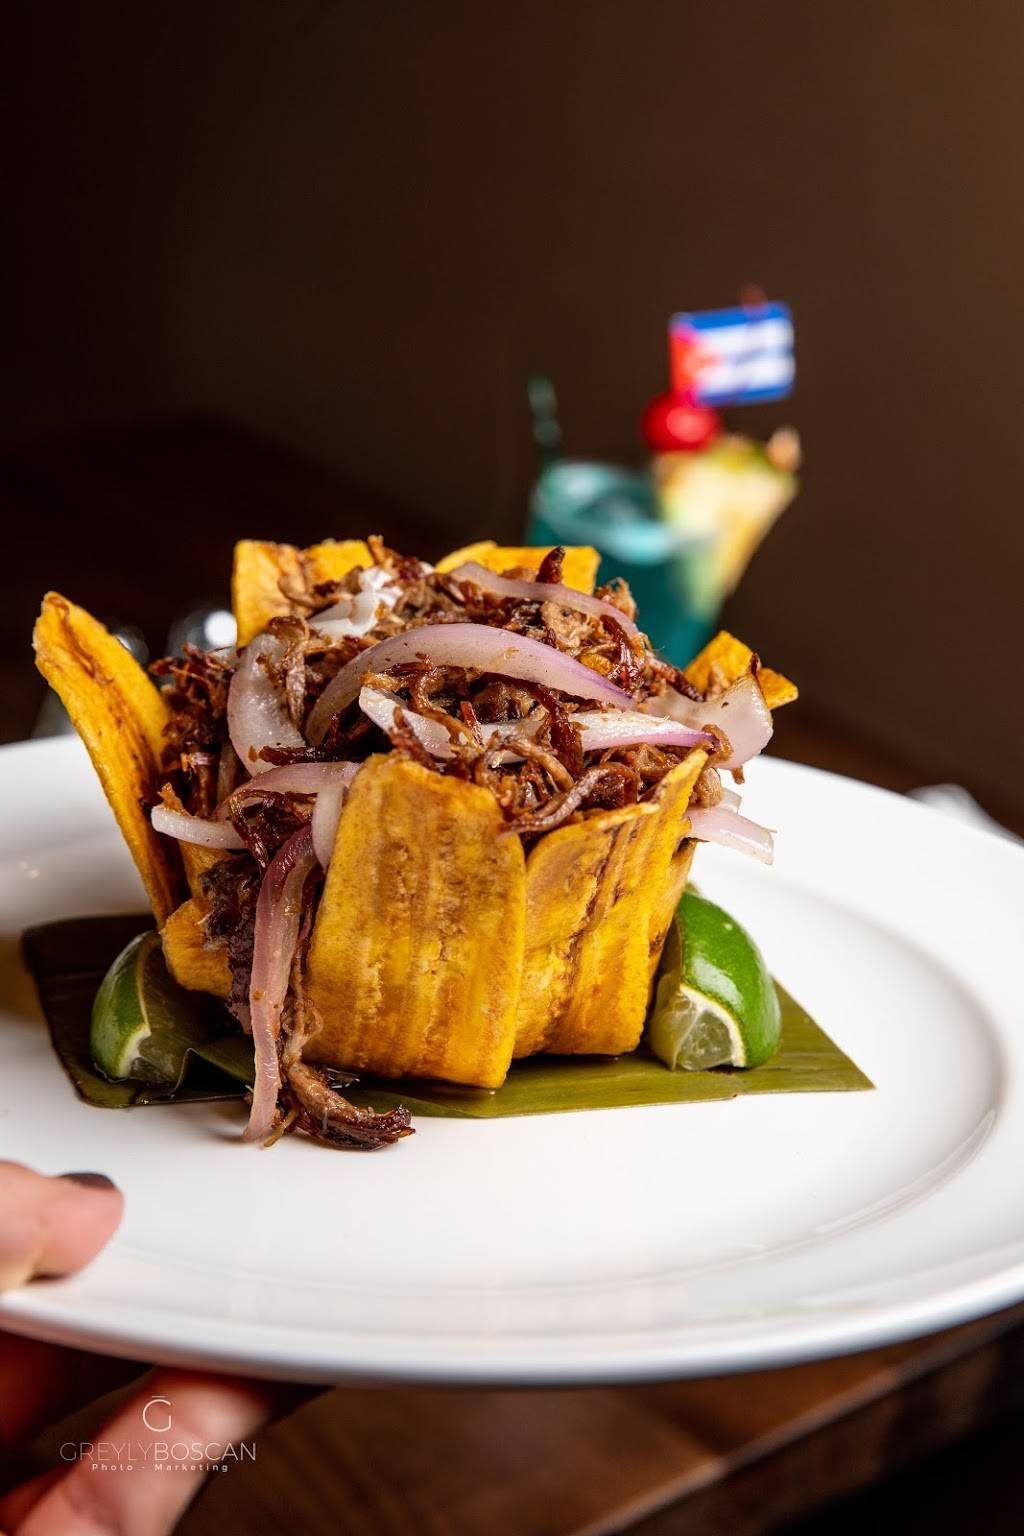 Rumba Cubana | restaurant | 235 Pavonia Ave, Jersey City, NJ 07302, USA | 2018784400 OR +1 201-878-4400